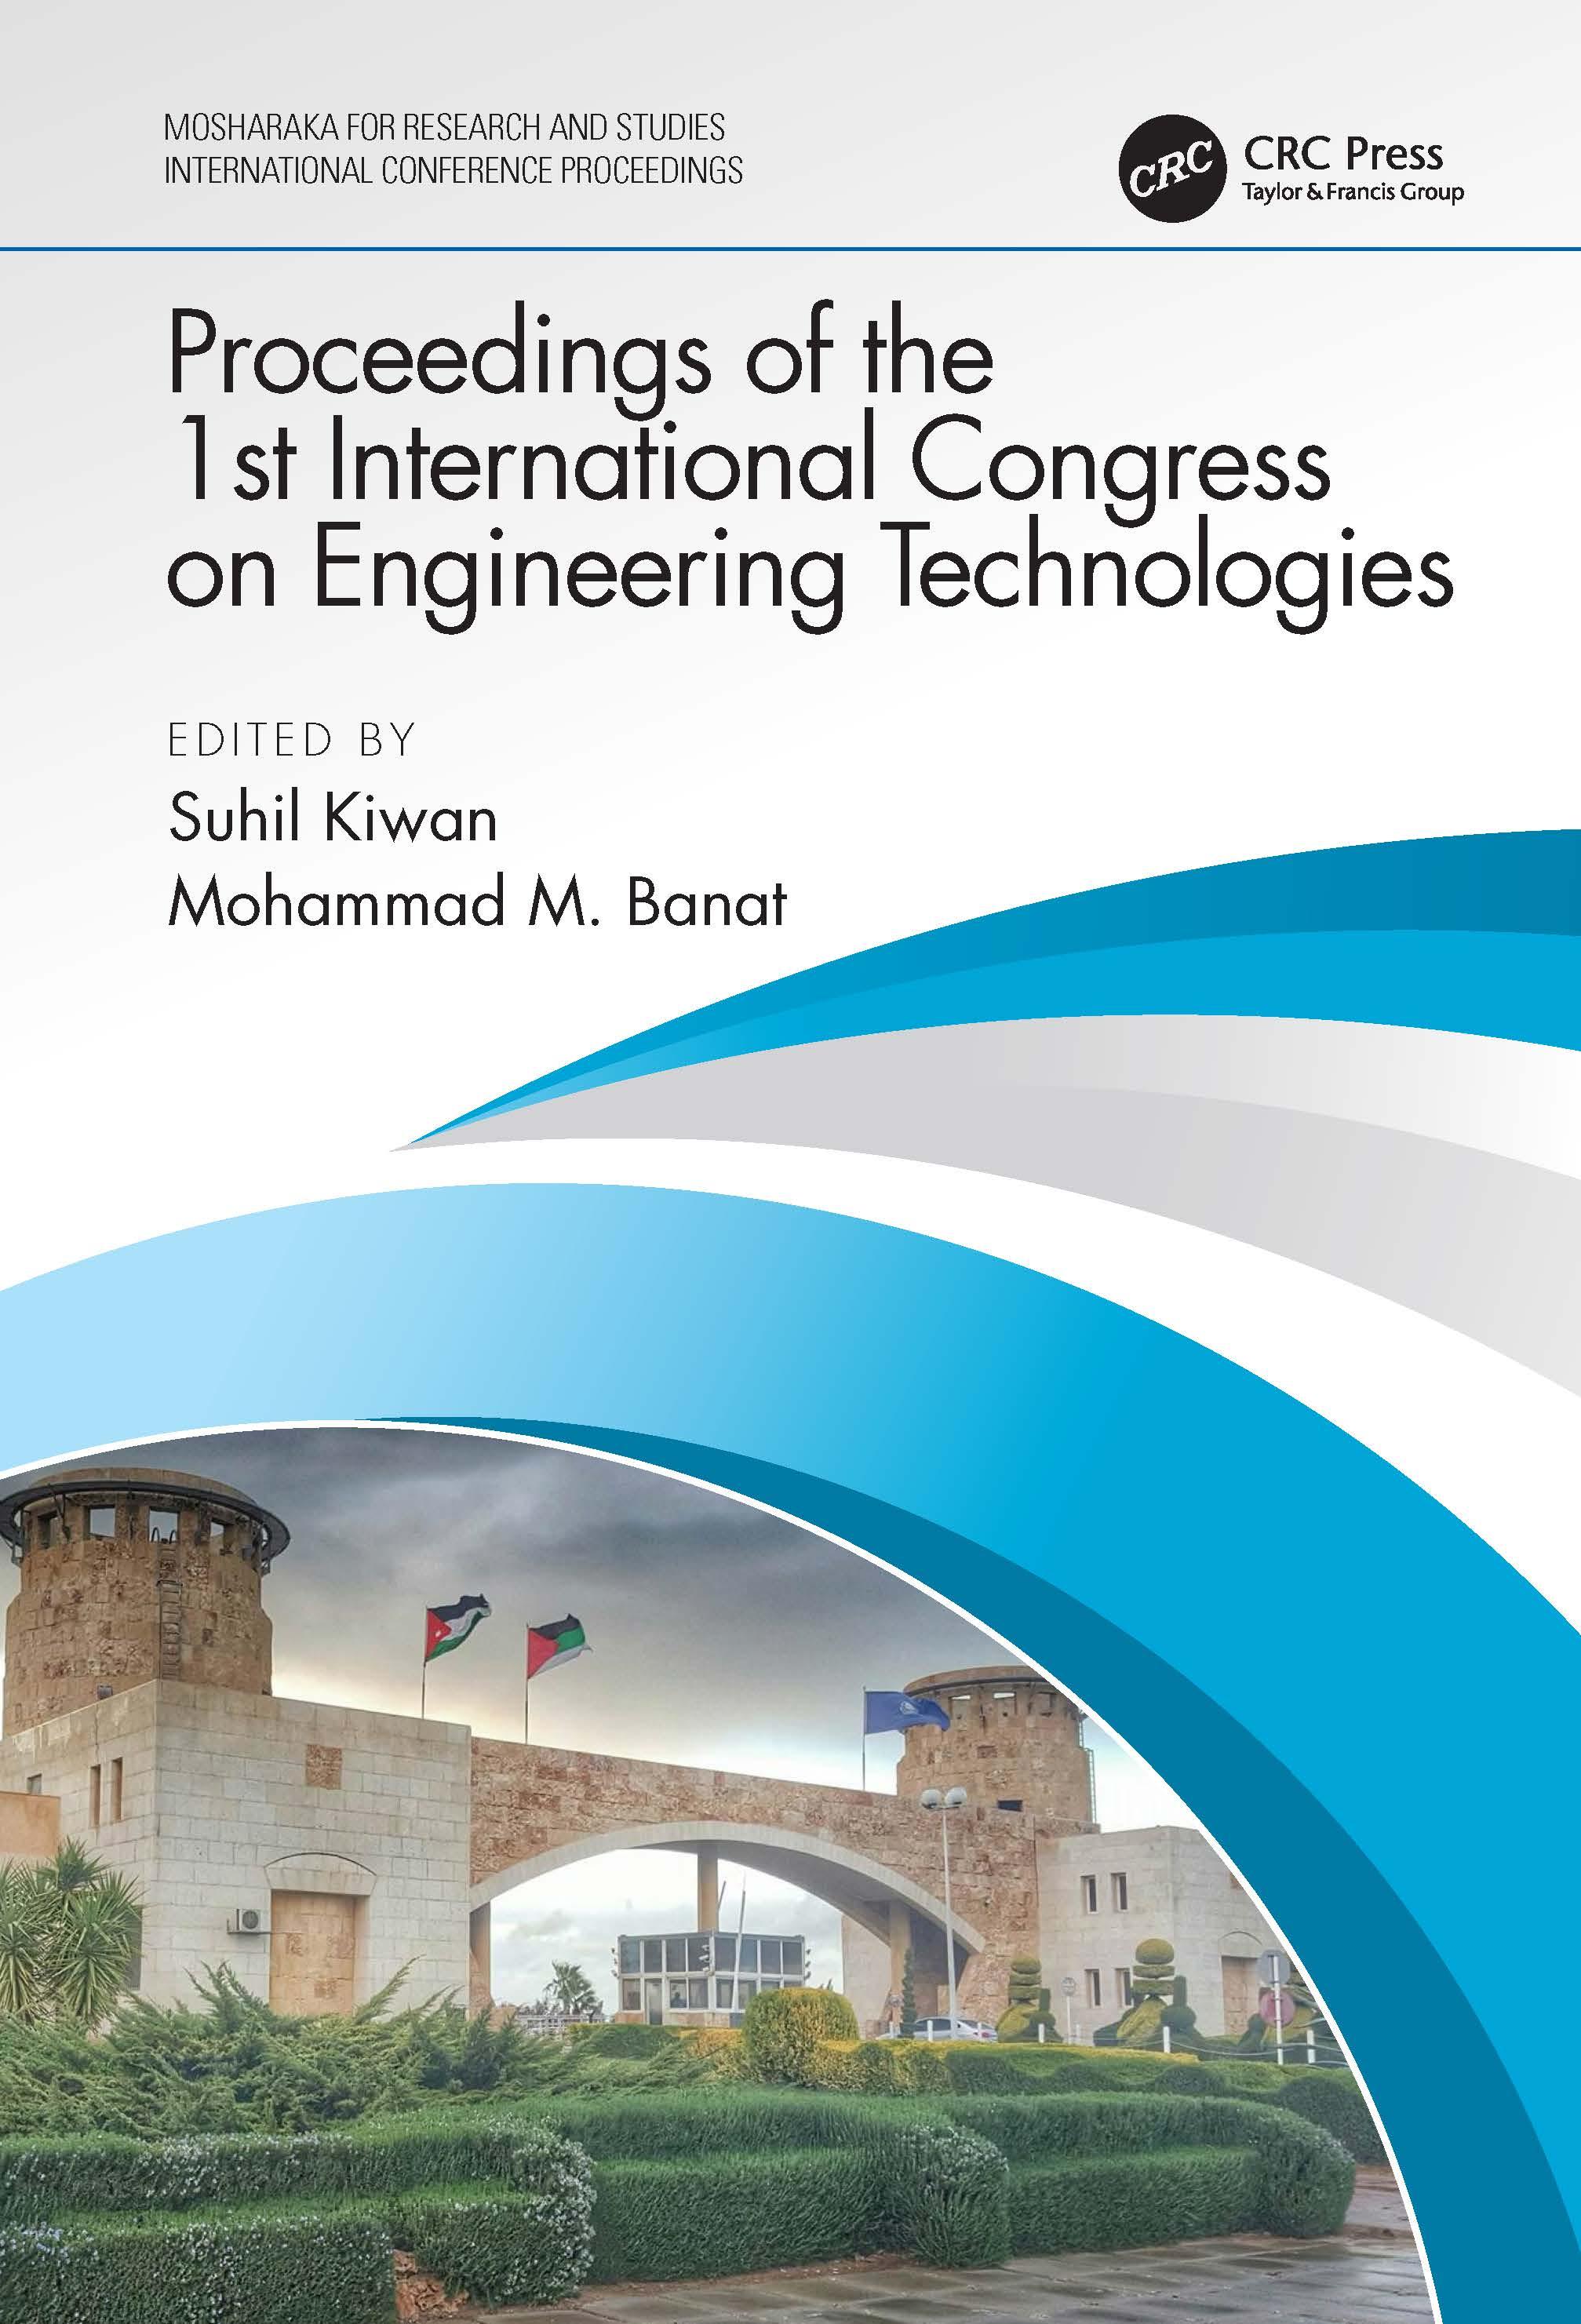 Proceedings of the 1st International Congress on Engineering Technologies